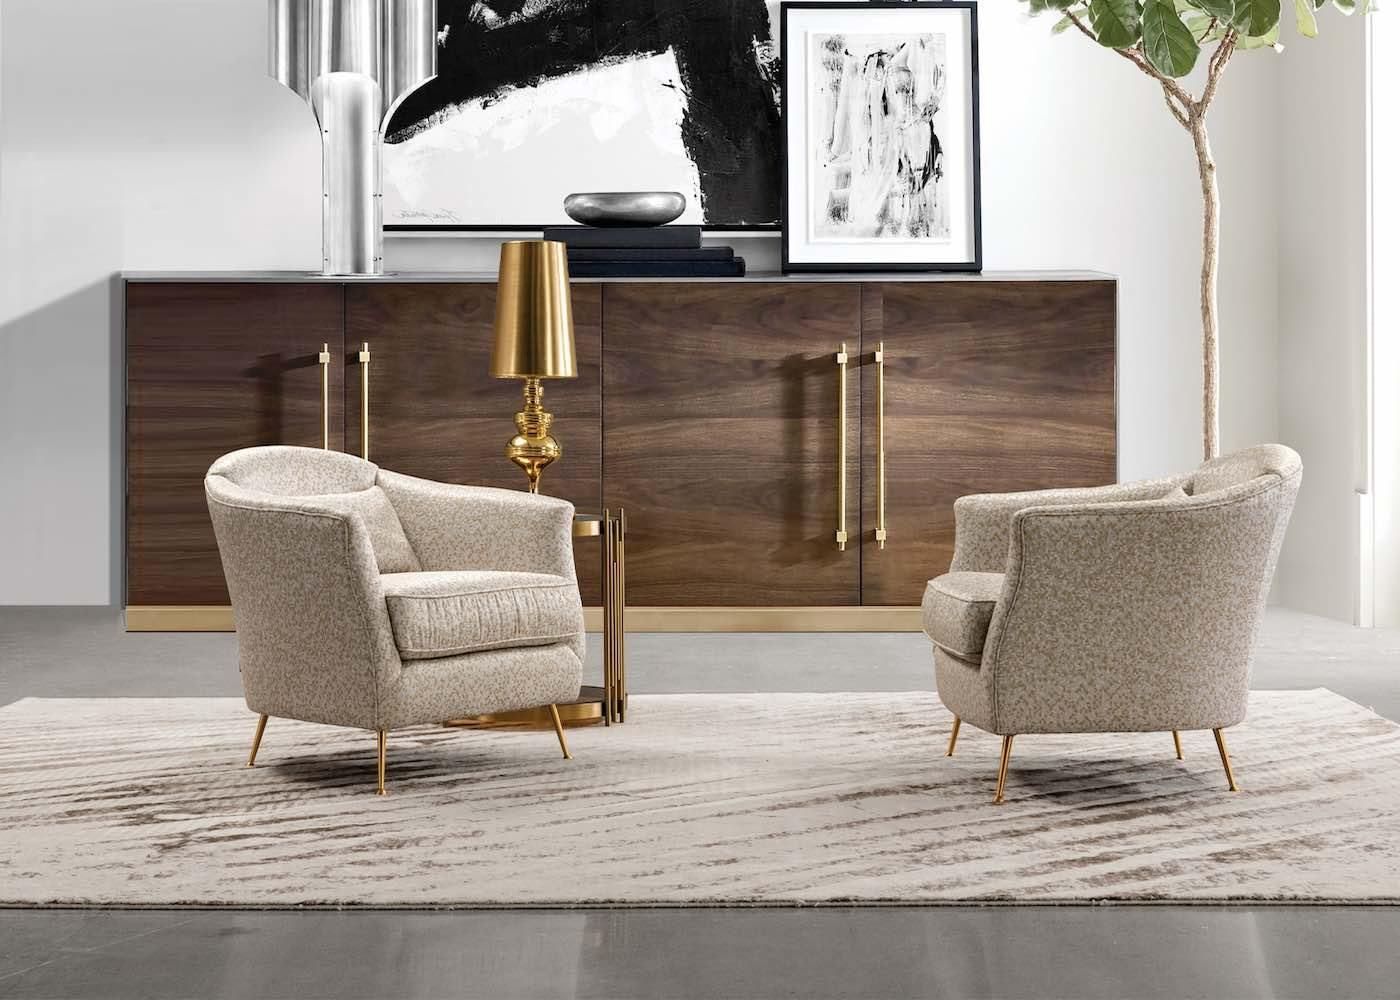 mazarin-ameublement-catalogue-produits-chaise-fauteuil-26